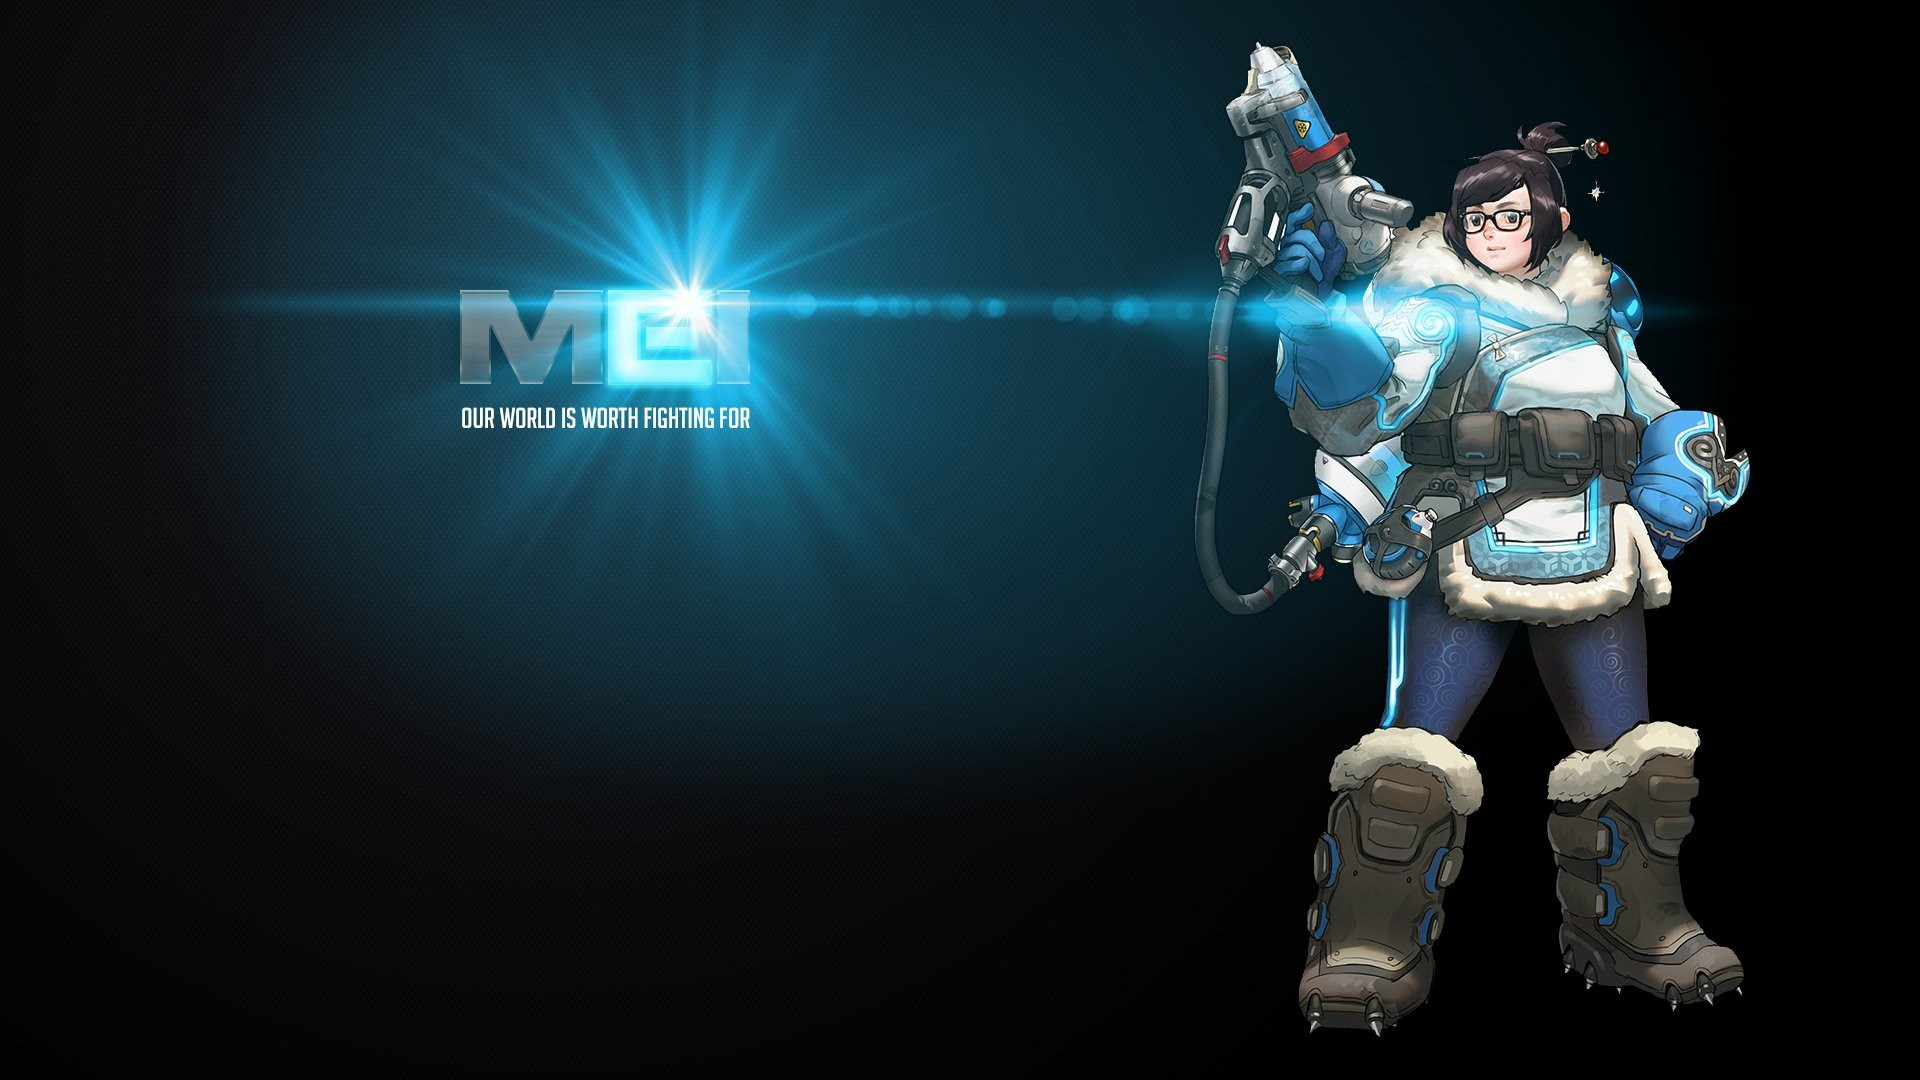 Overwatch Mei Wallpaper ① Download Free Wallpapers For Desktop And